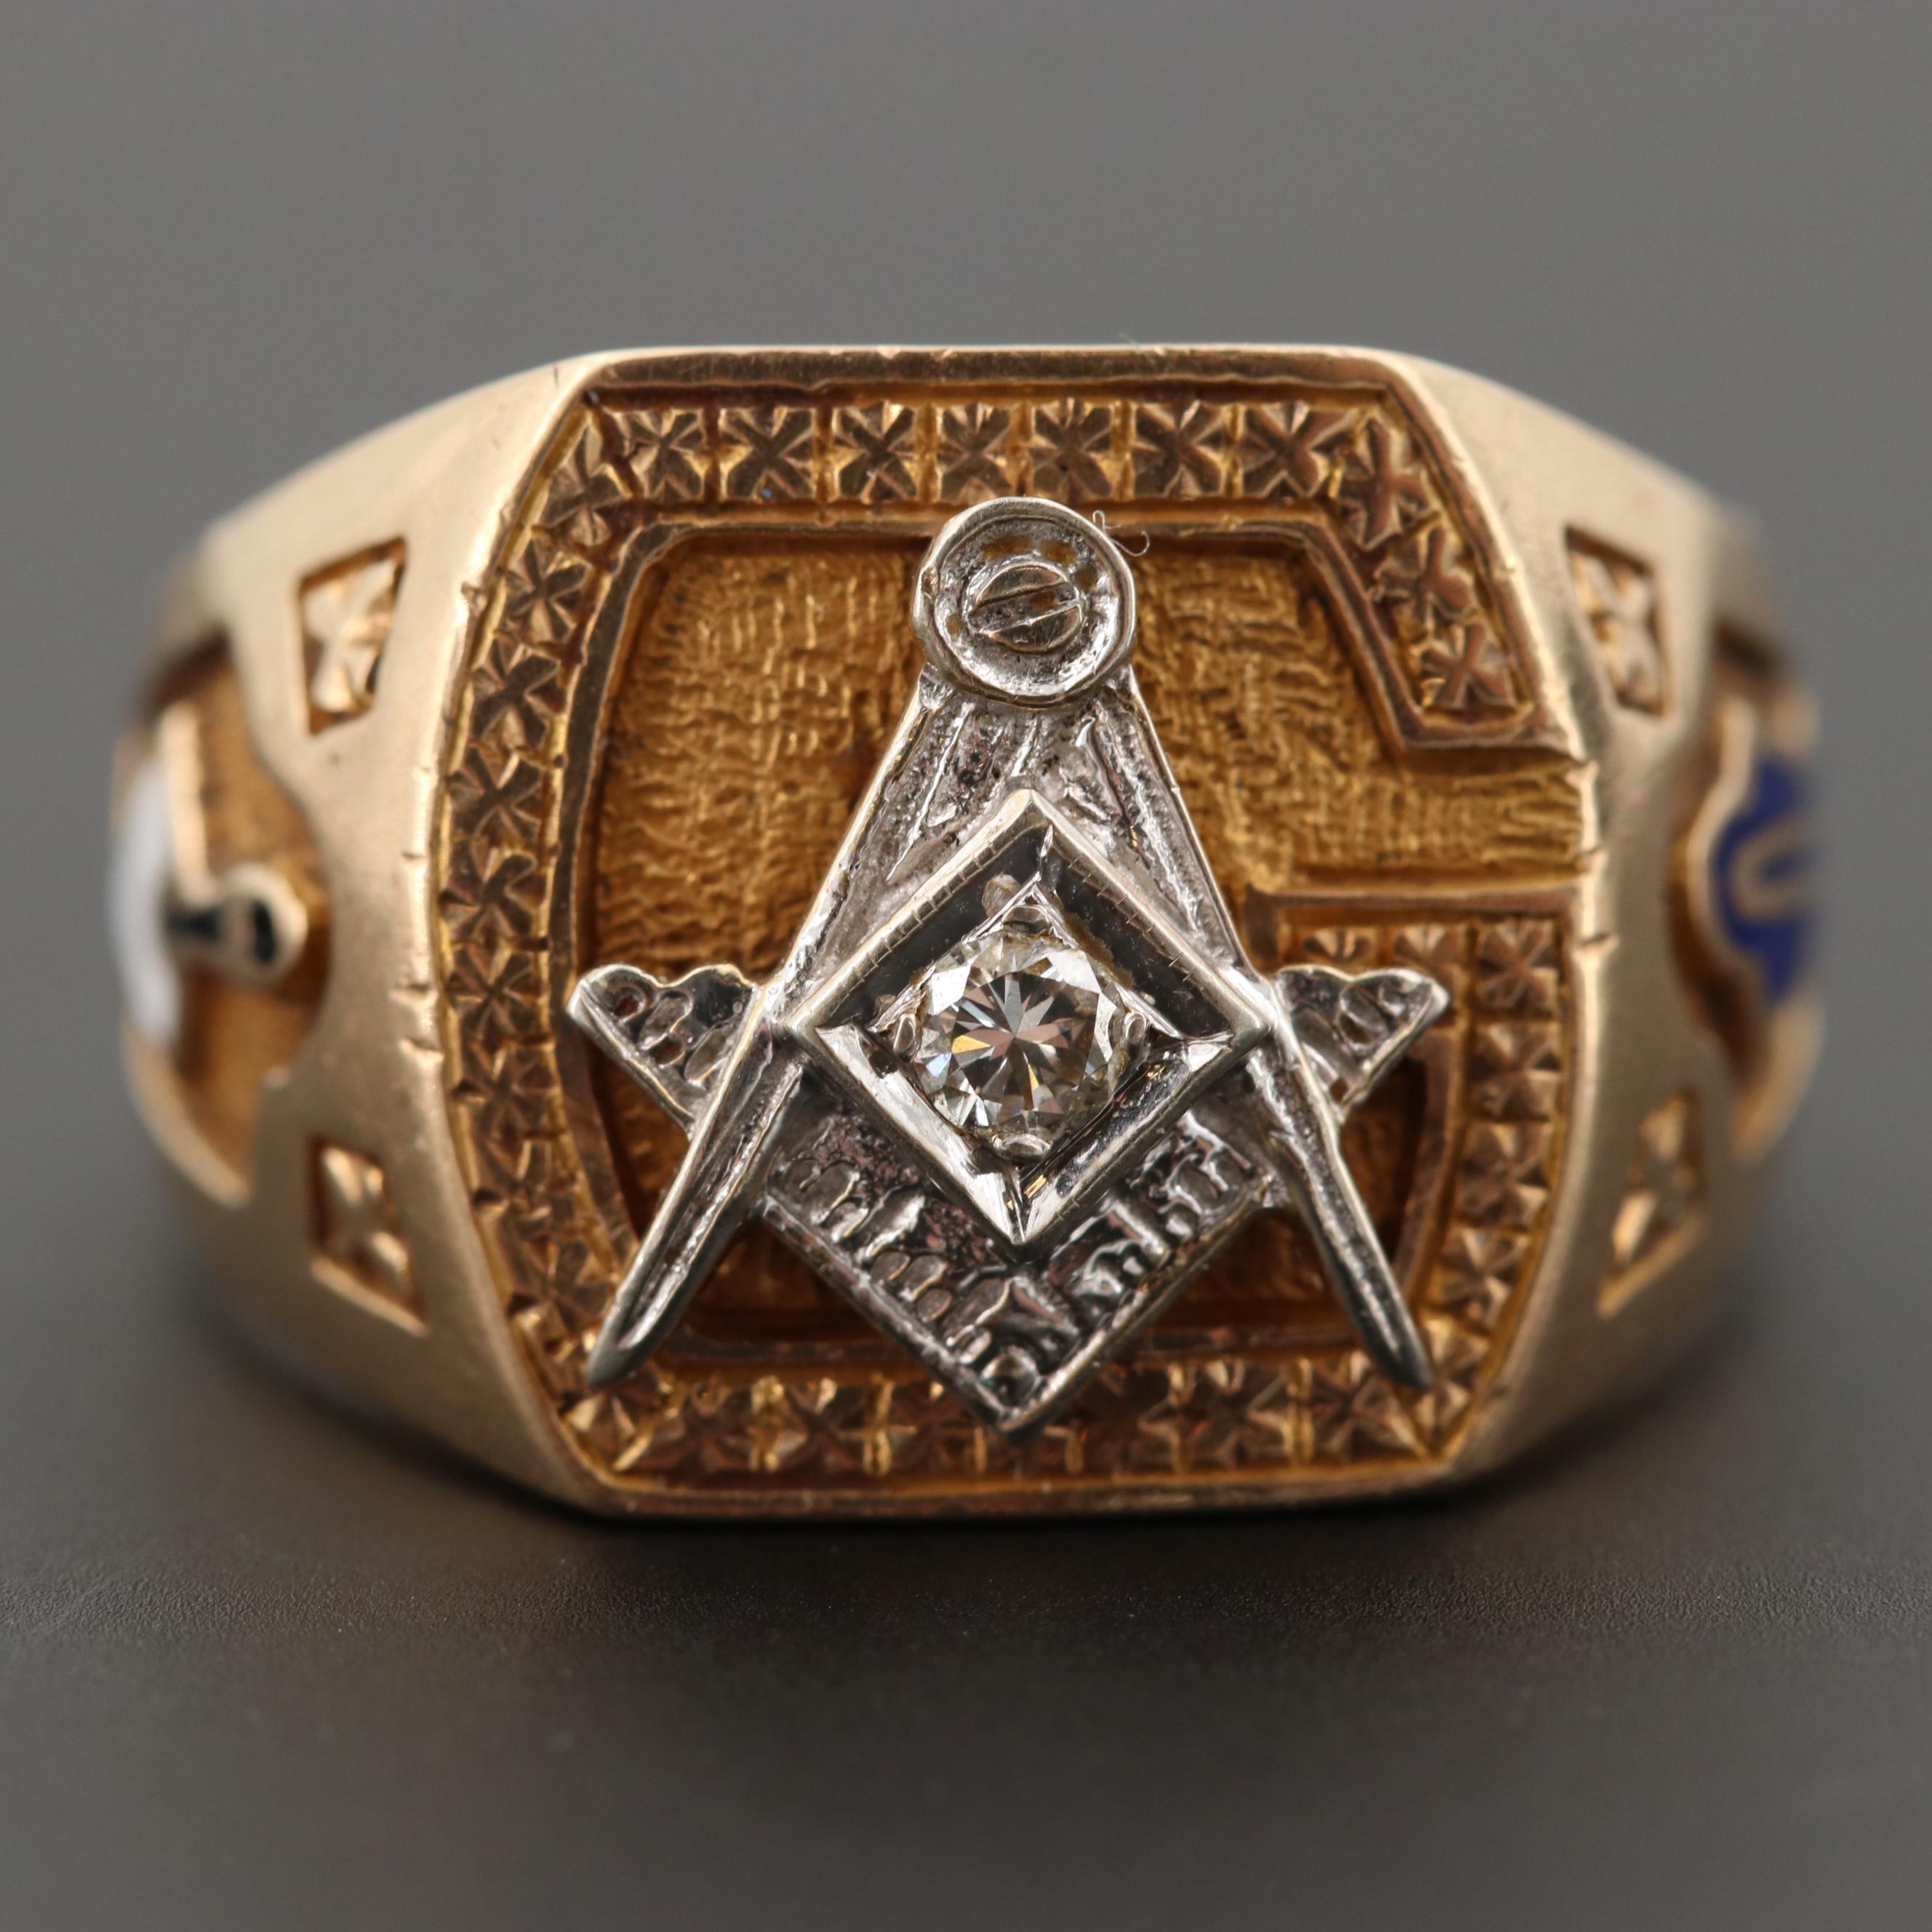 10K Yellow Gold Diamond Masonic Ring with 14K White Gold Crest